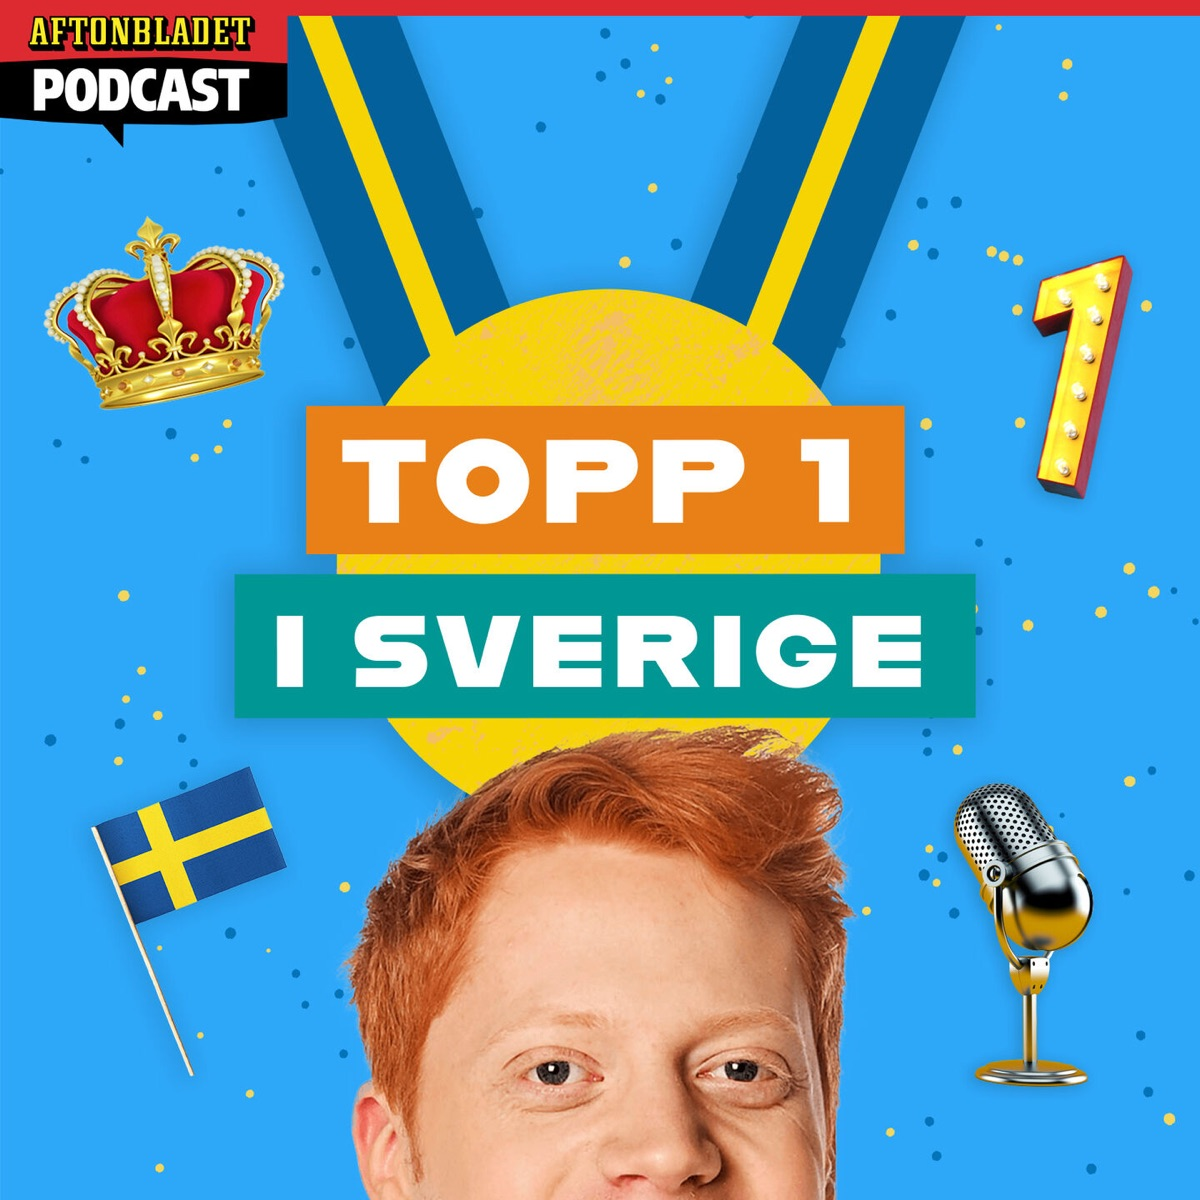 Topp 1 i Sverige